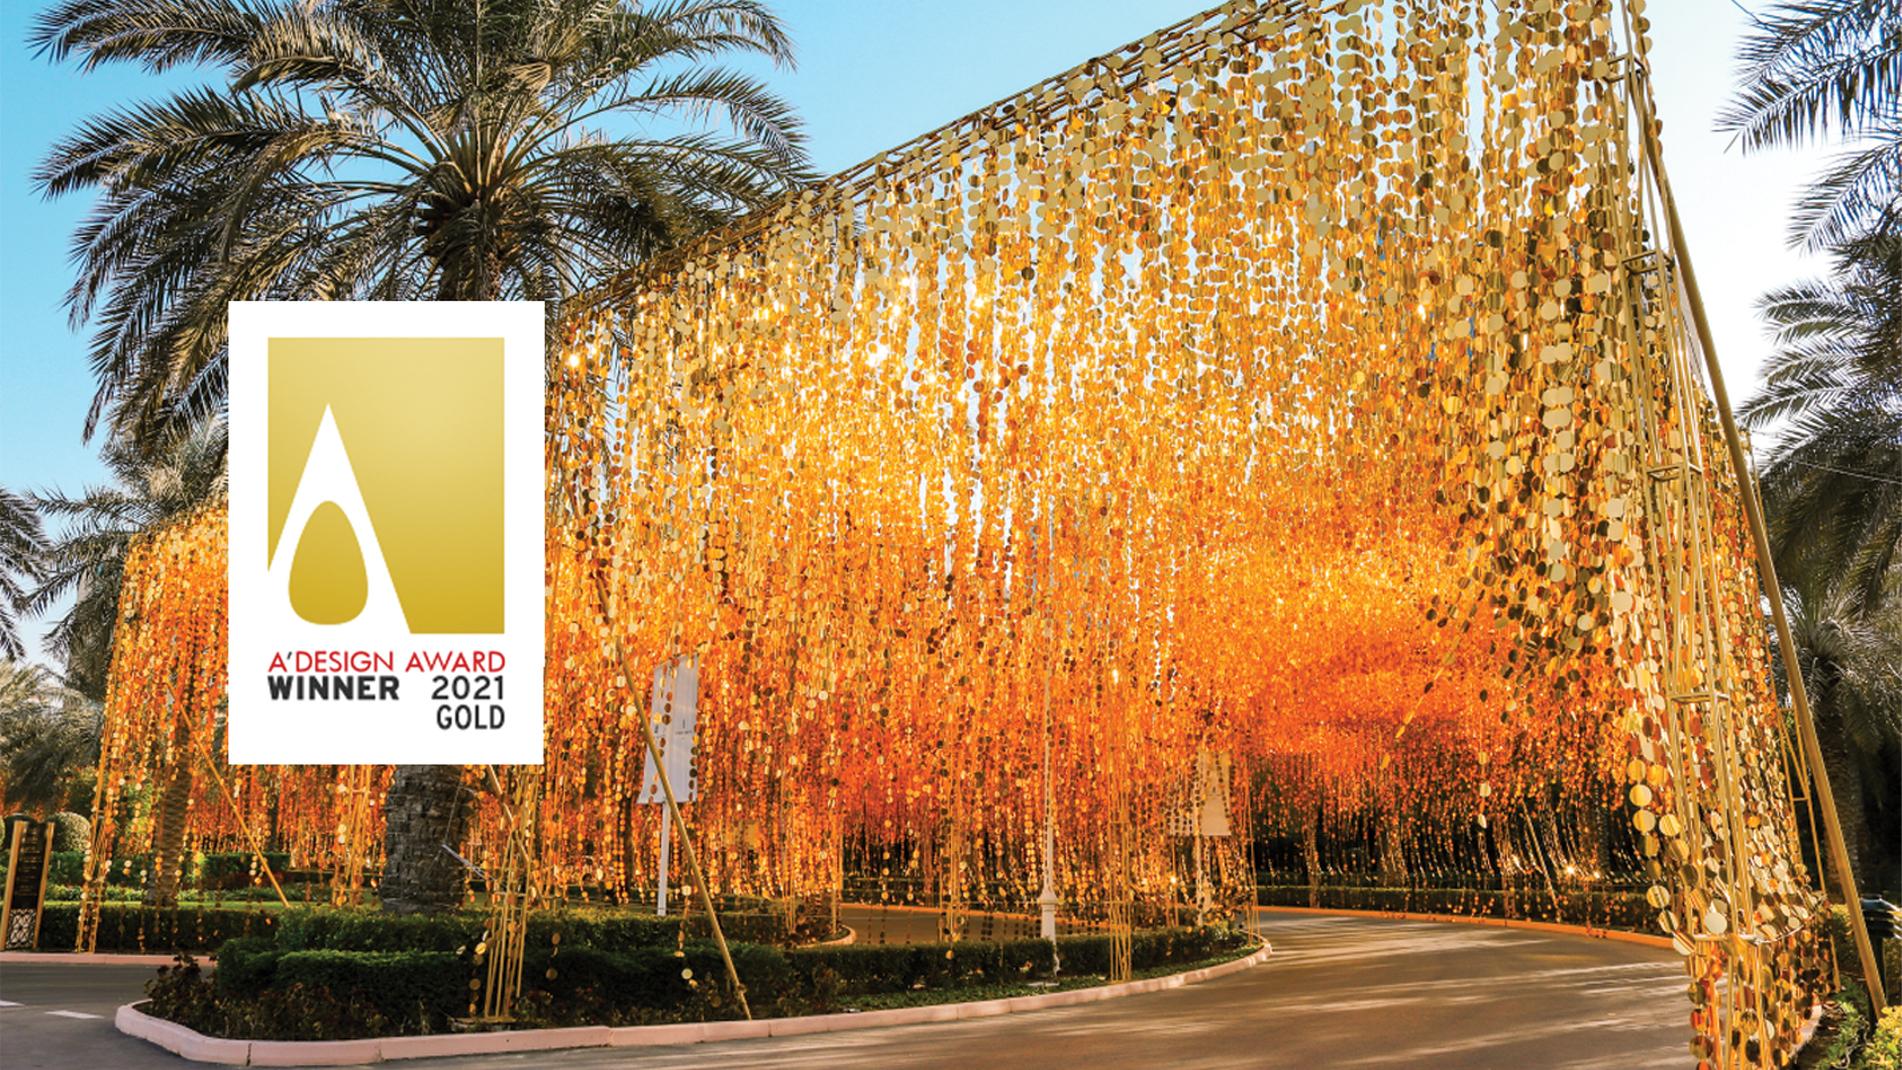 Le Top 20 Lauréats A' Design Award